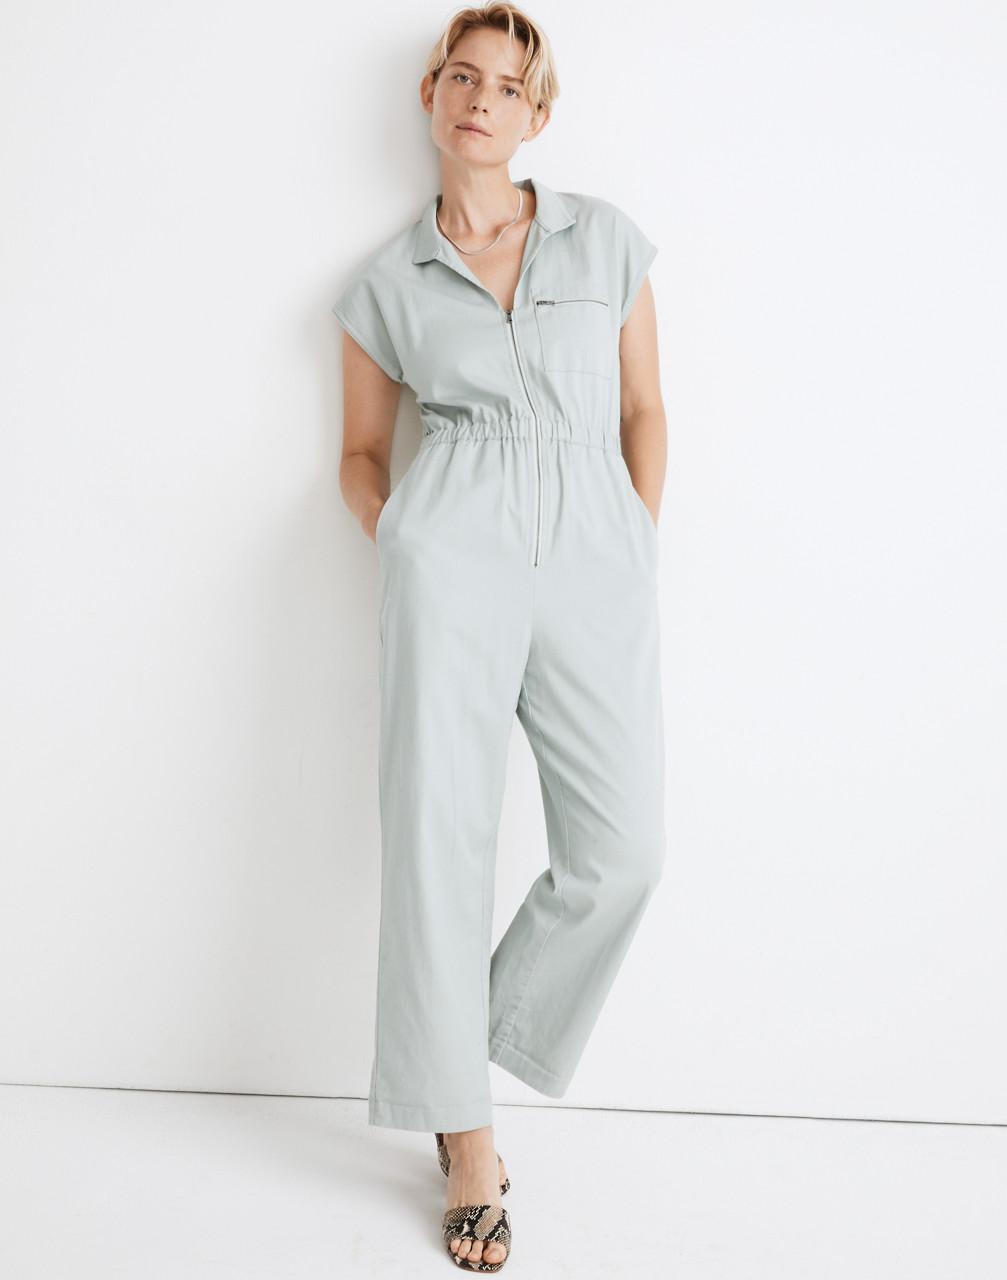 70s Jumpsuit | Disco Jumpsuits, Sequin Rompers Short-Sleeve Zip-Pocket Coverall Jumpsuit $138.00 AT vintagedancer.com